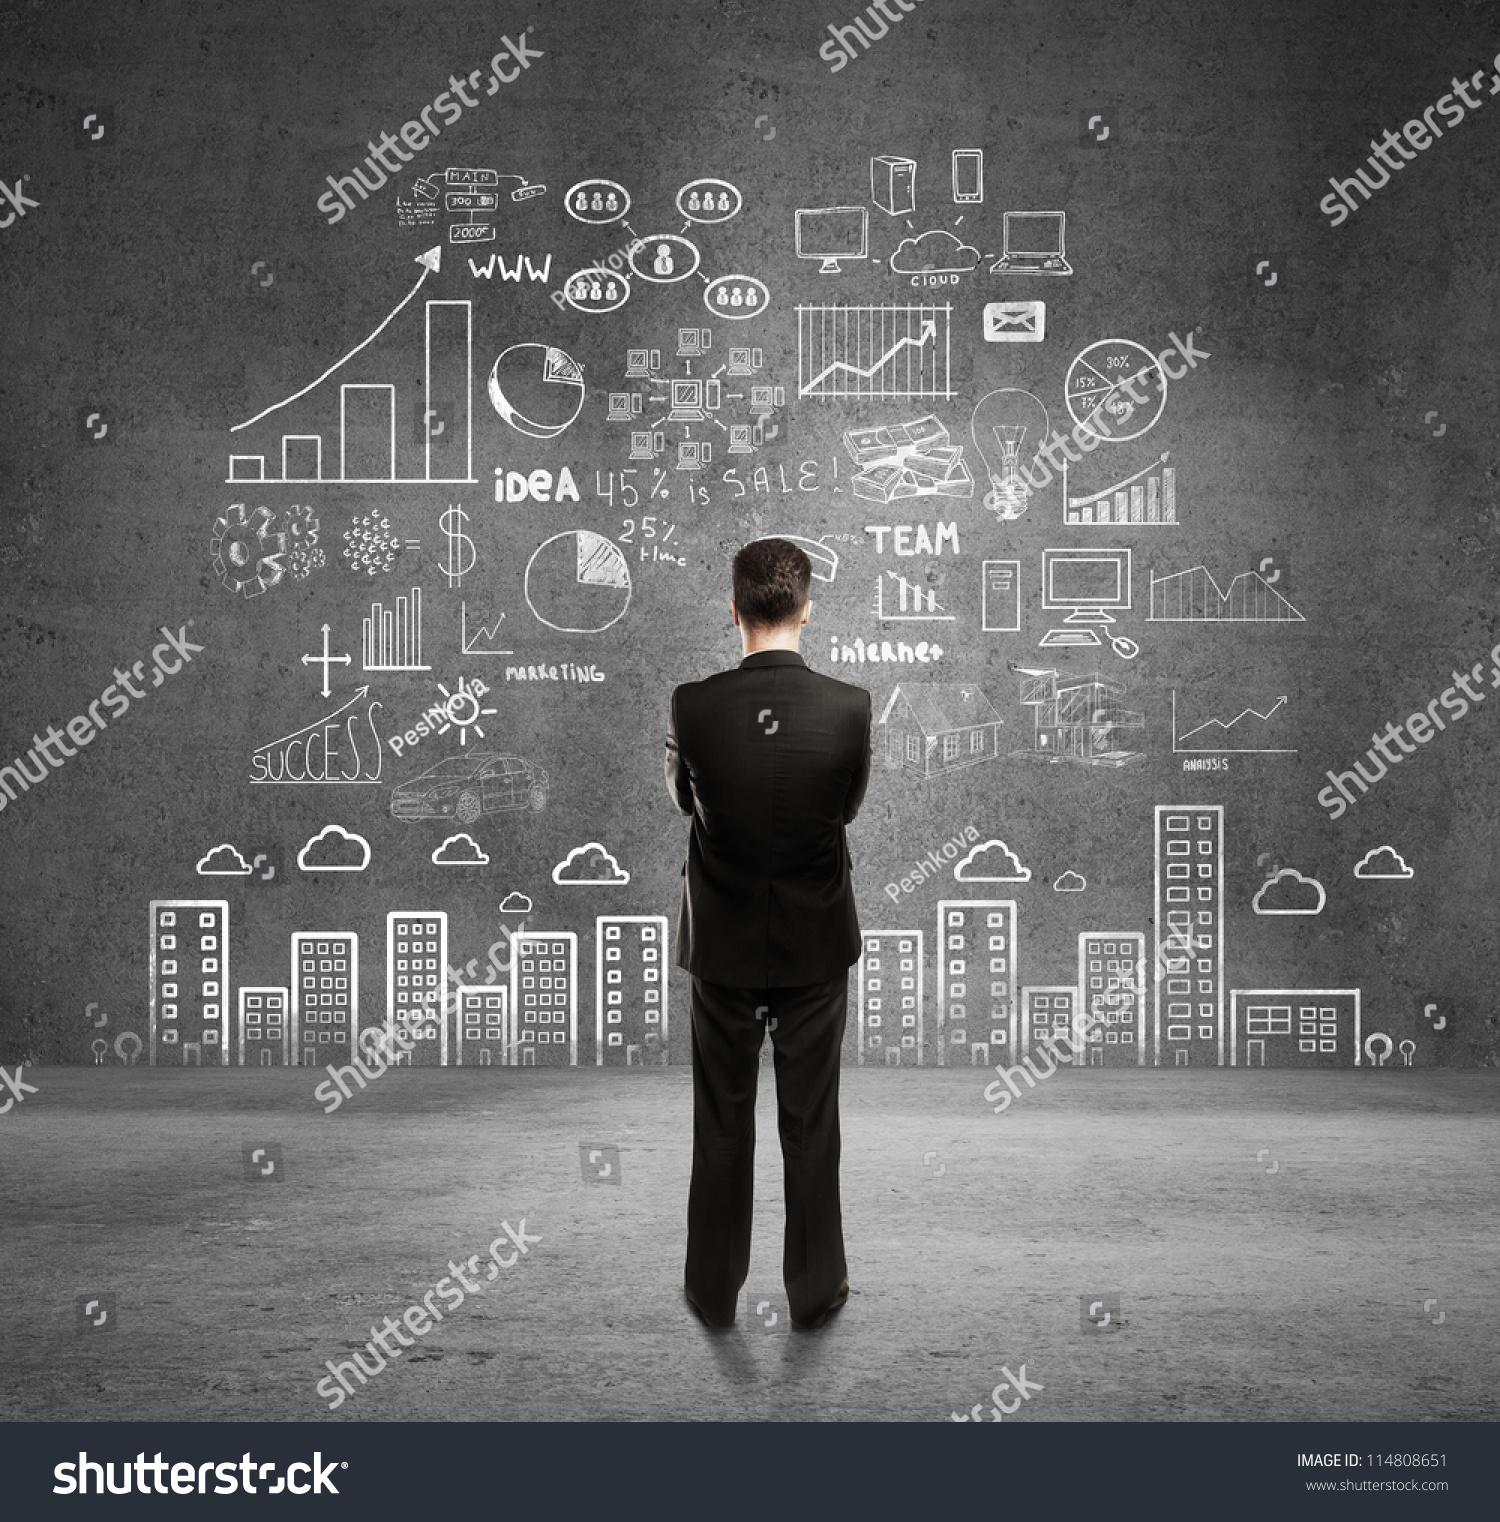 business wallpaper hd black